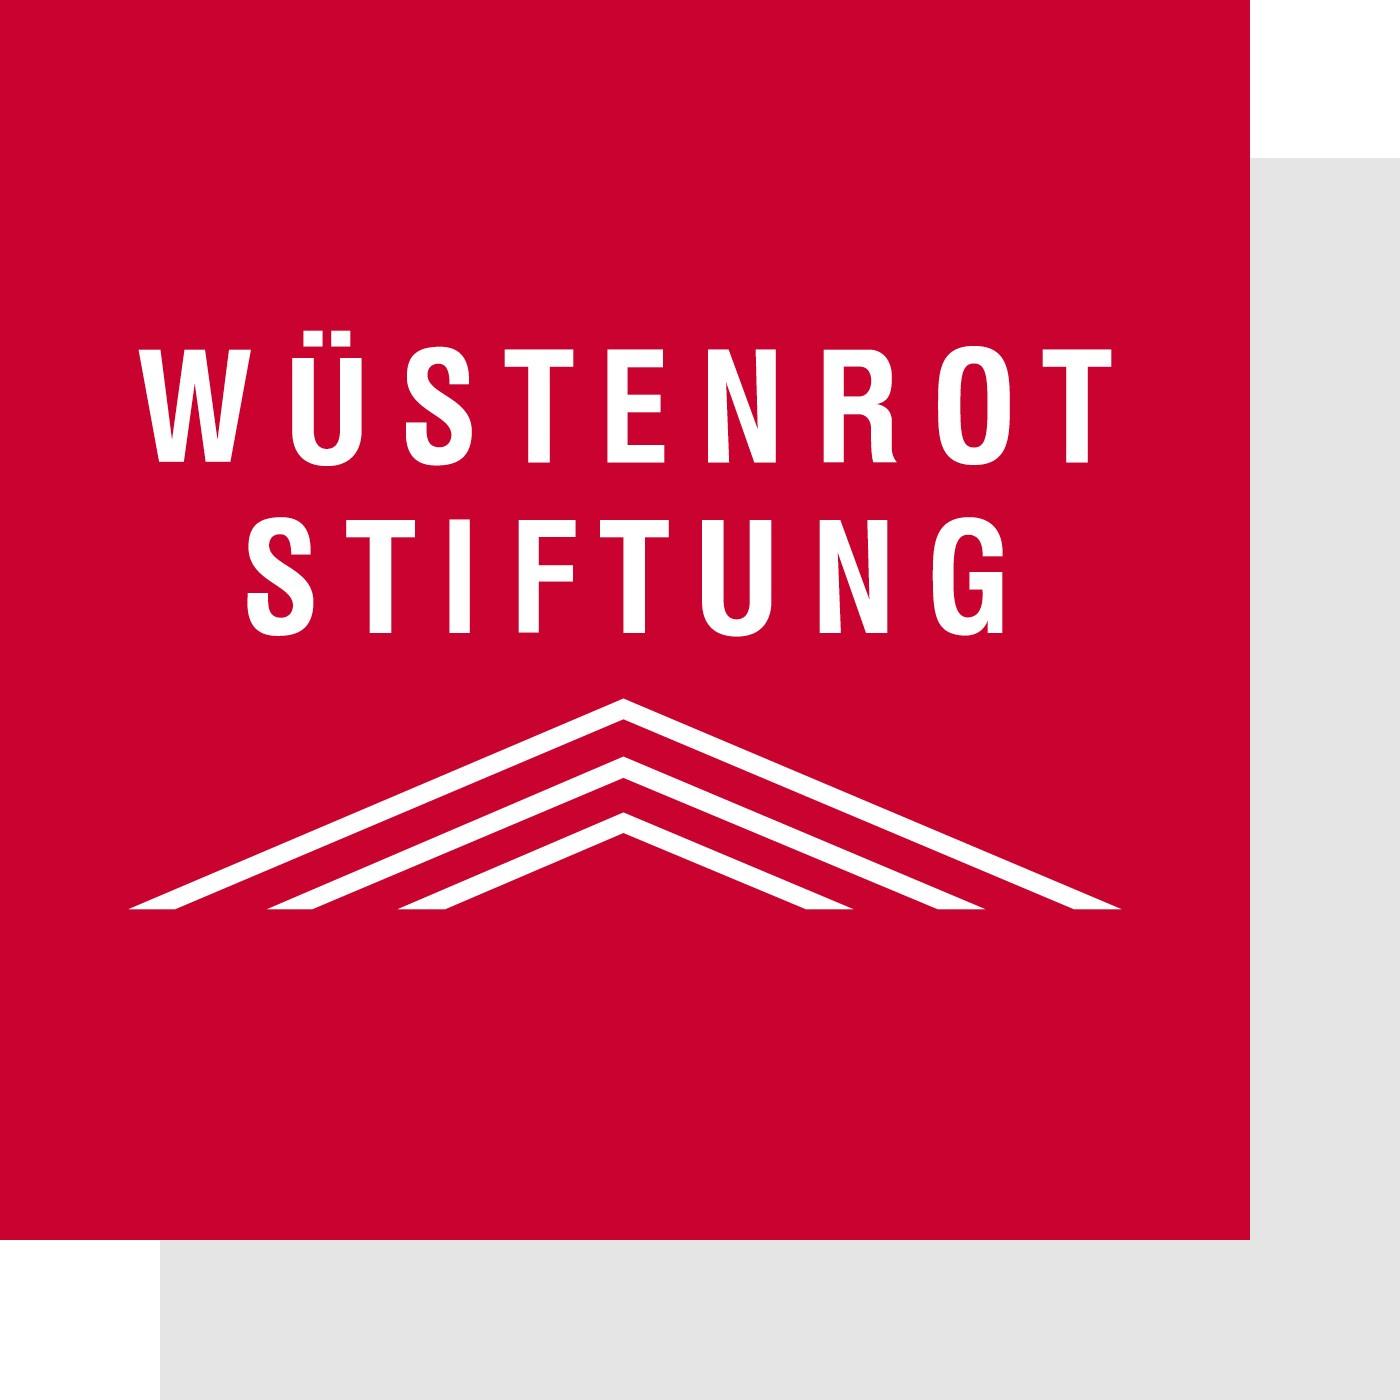 Wüstenrot Stiftung Podcast - Trailer